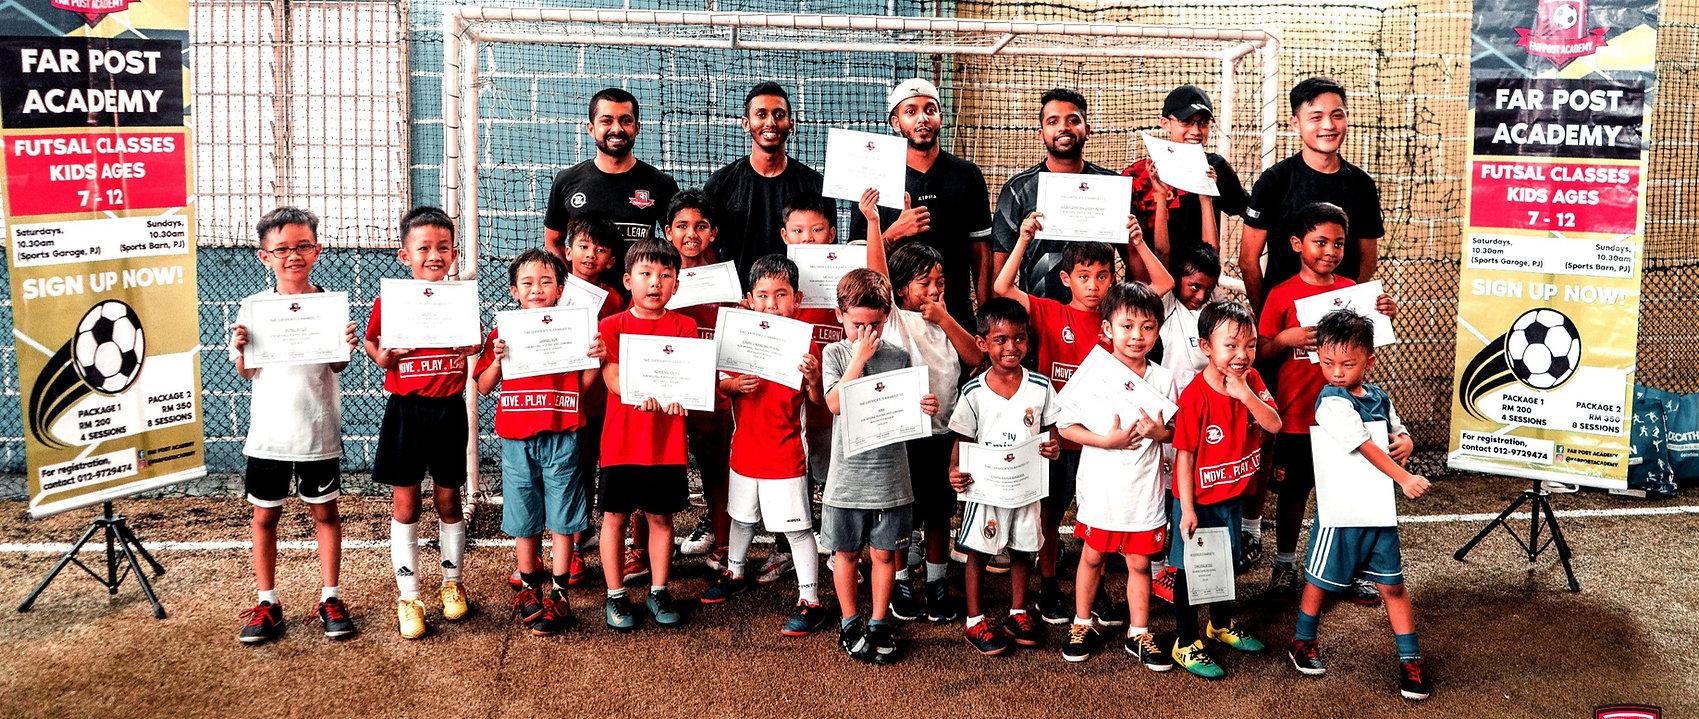 Far Post Academy Futsal Class - Certified futsal coaches and students holding certificates on futsal pitch